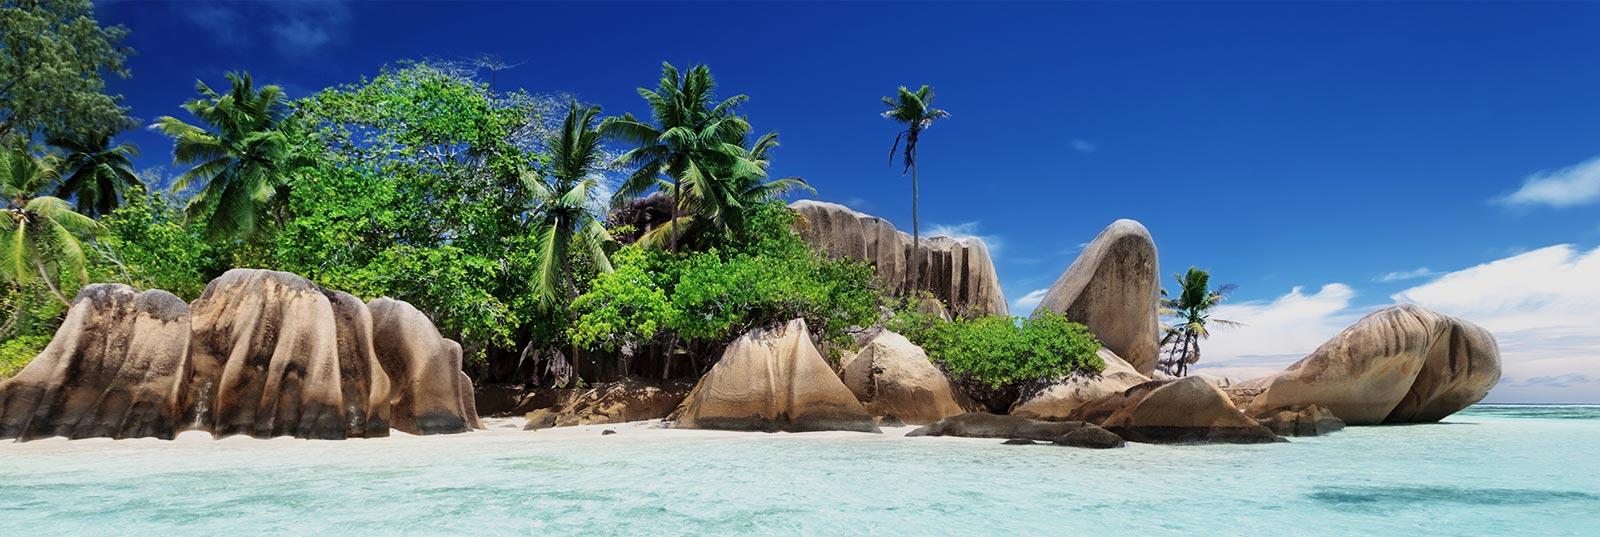 Guía turística de Seychelles